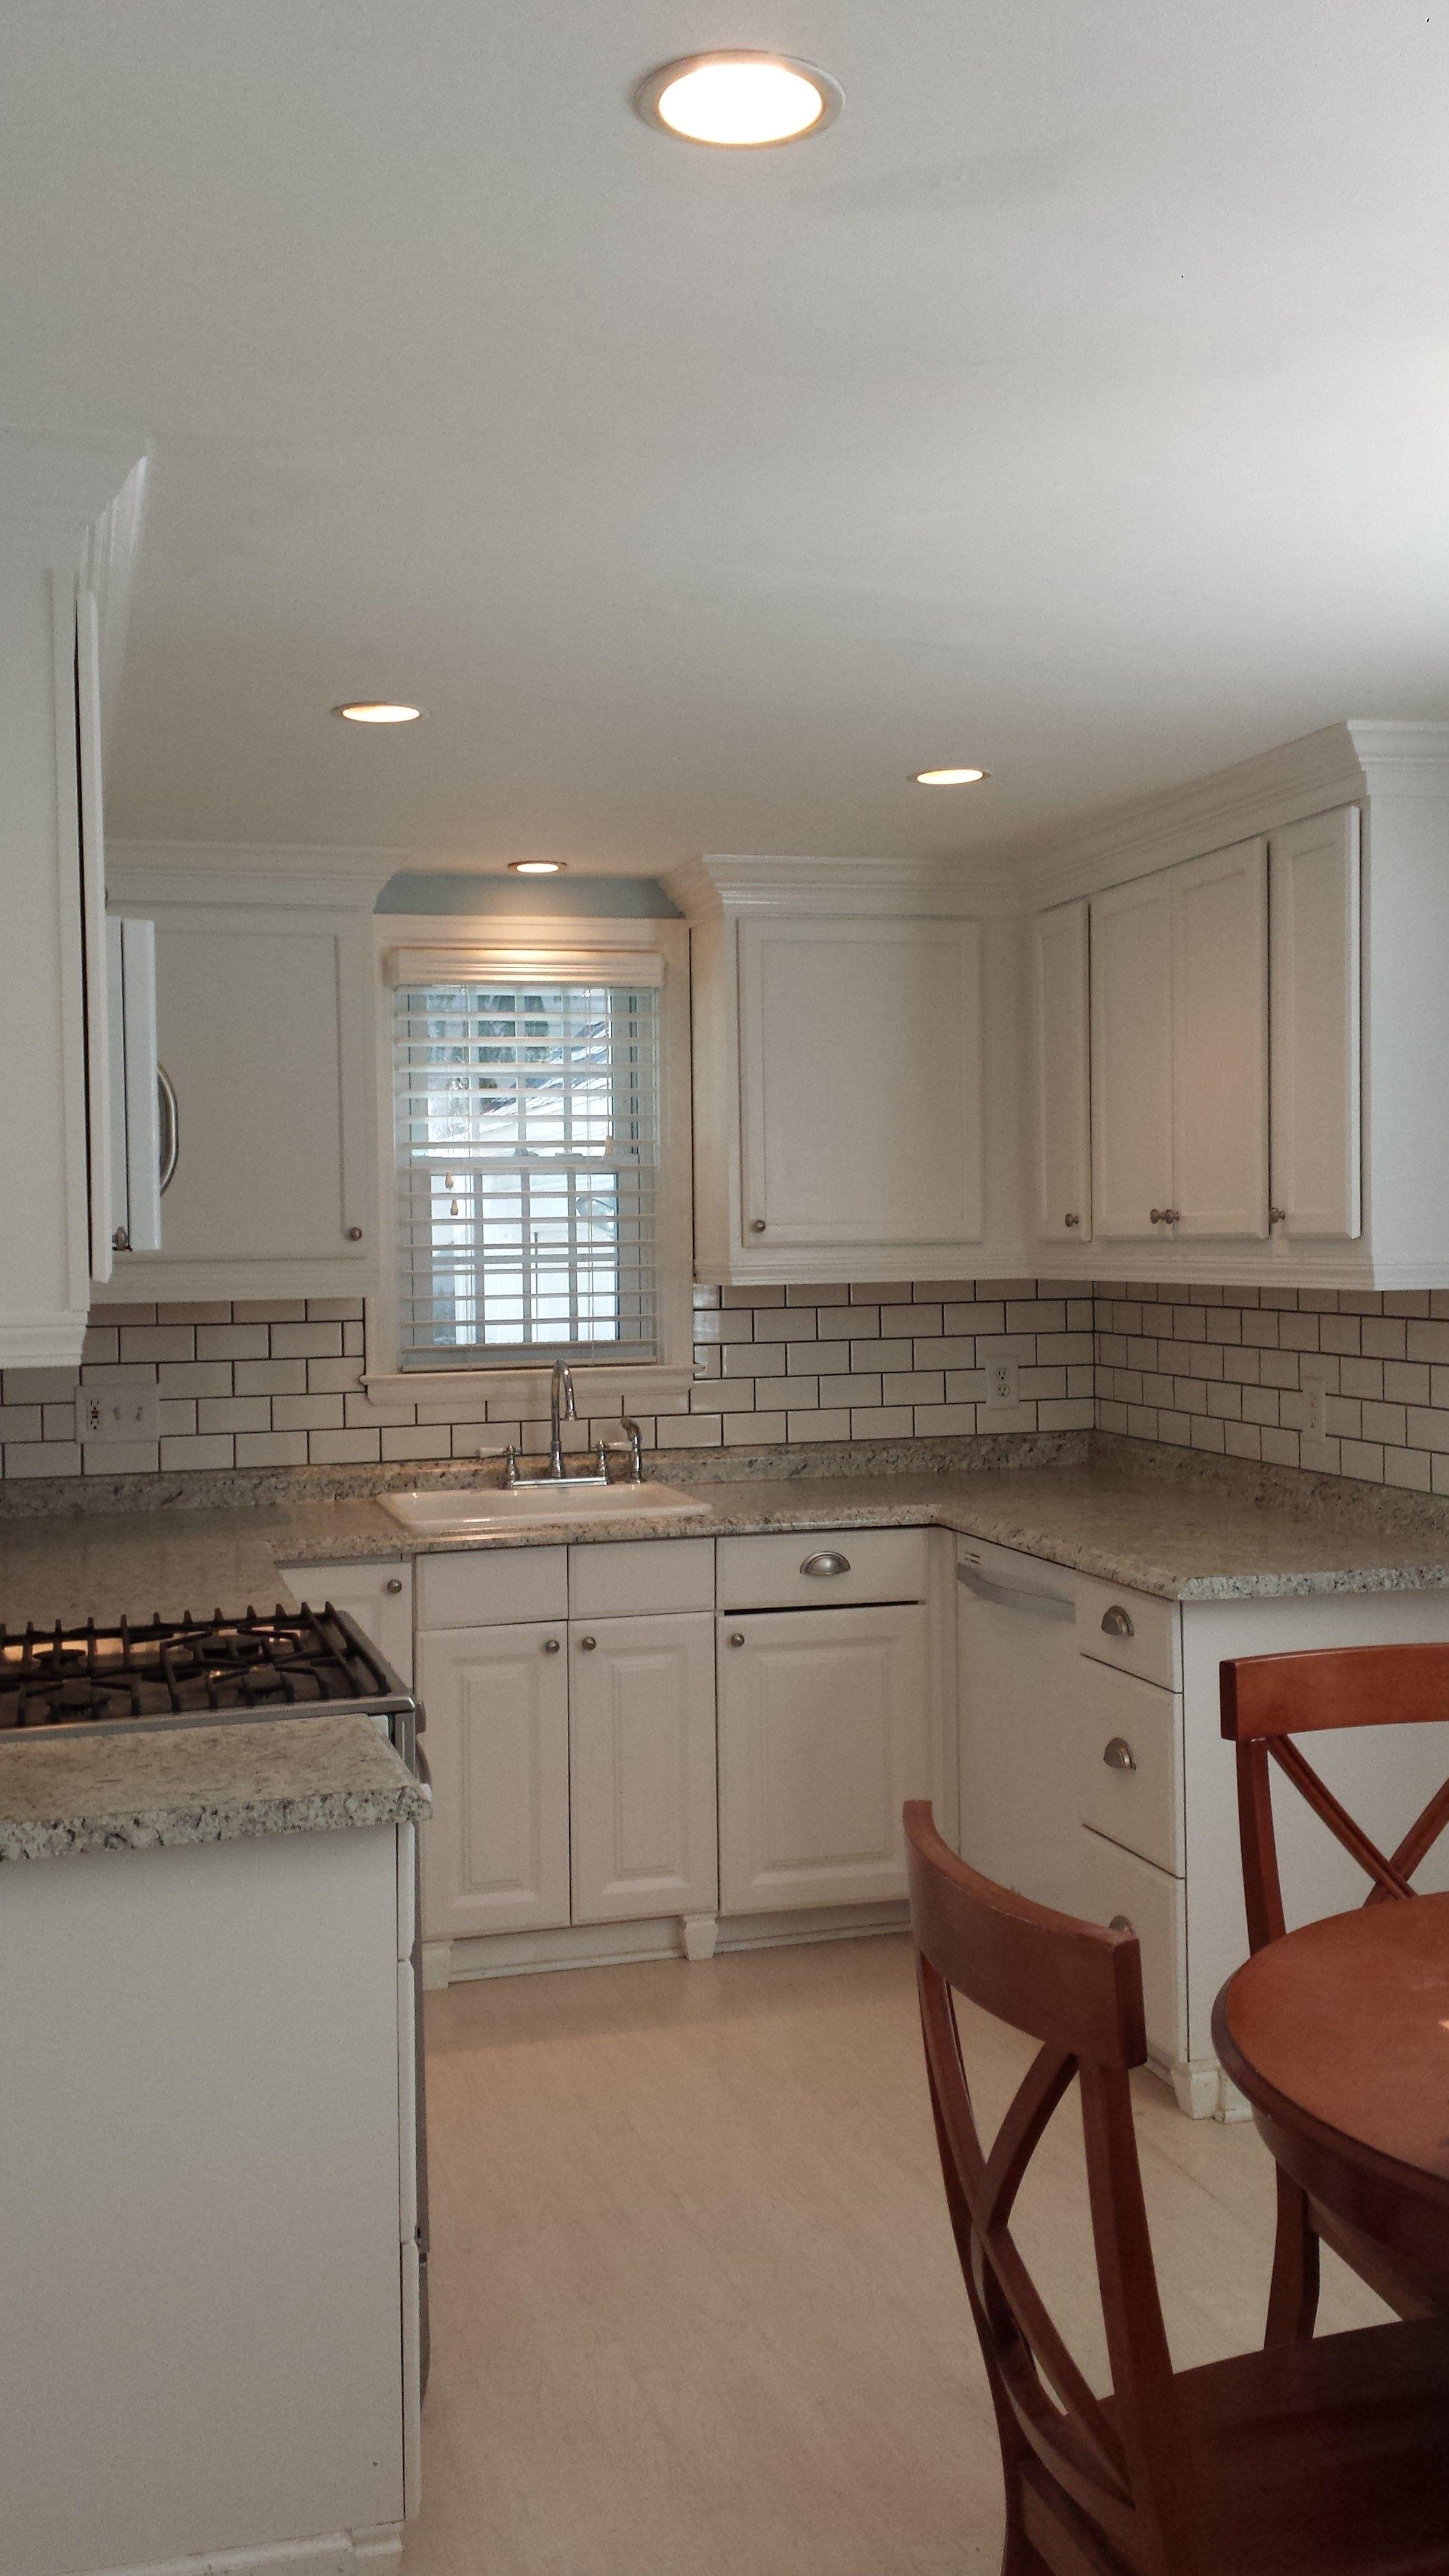 Best Phase 3 Of Kitchen Renovation Upper Cabinets Installed 400 x 300